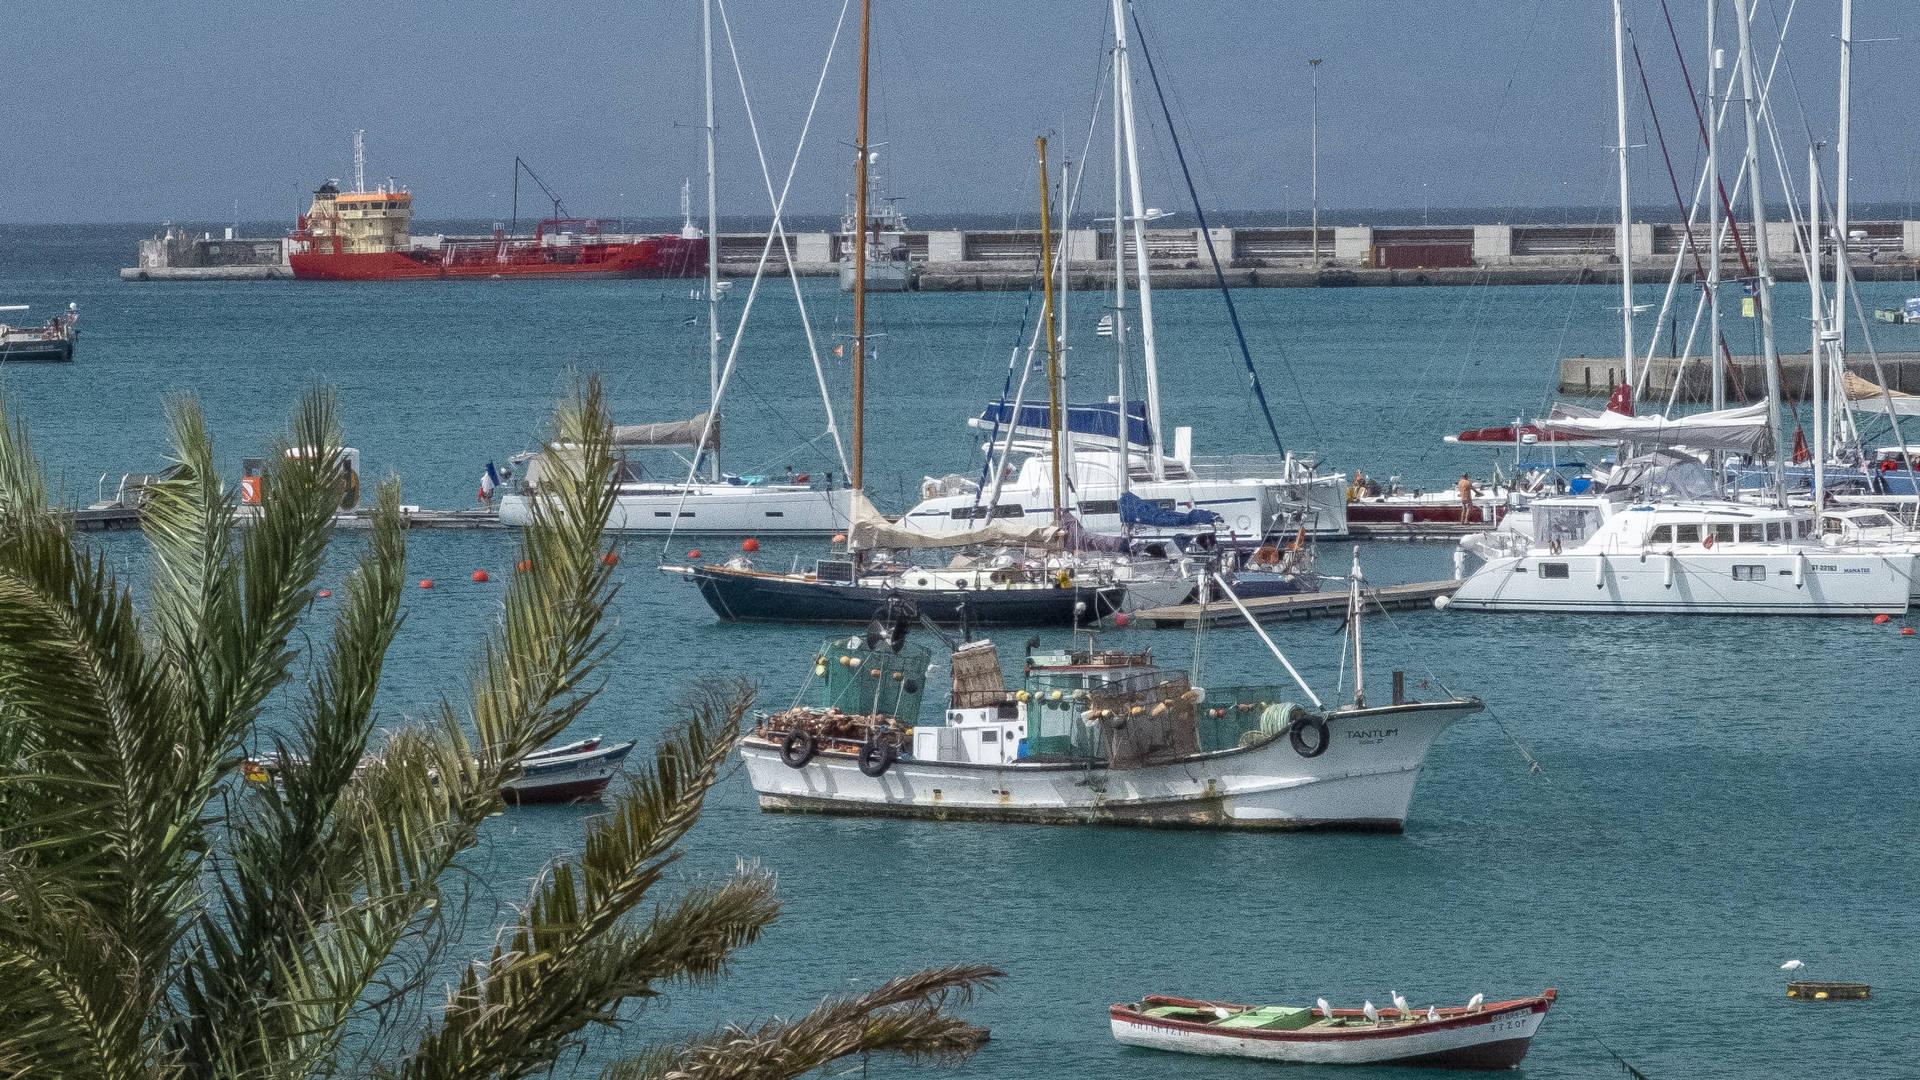 De haven van Sao Vicente - Zo neem je de veerboot tussen São Vicente en Santo Antão